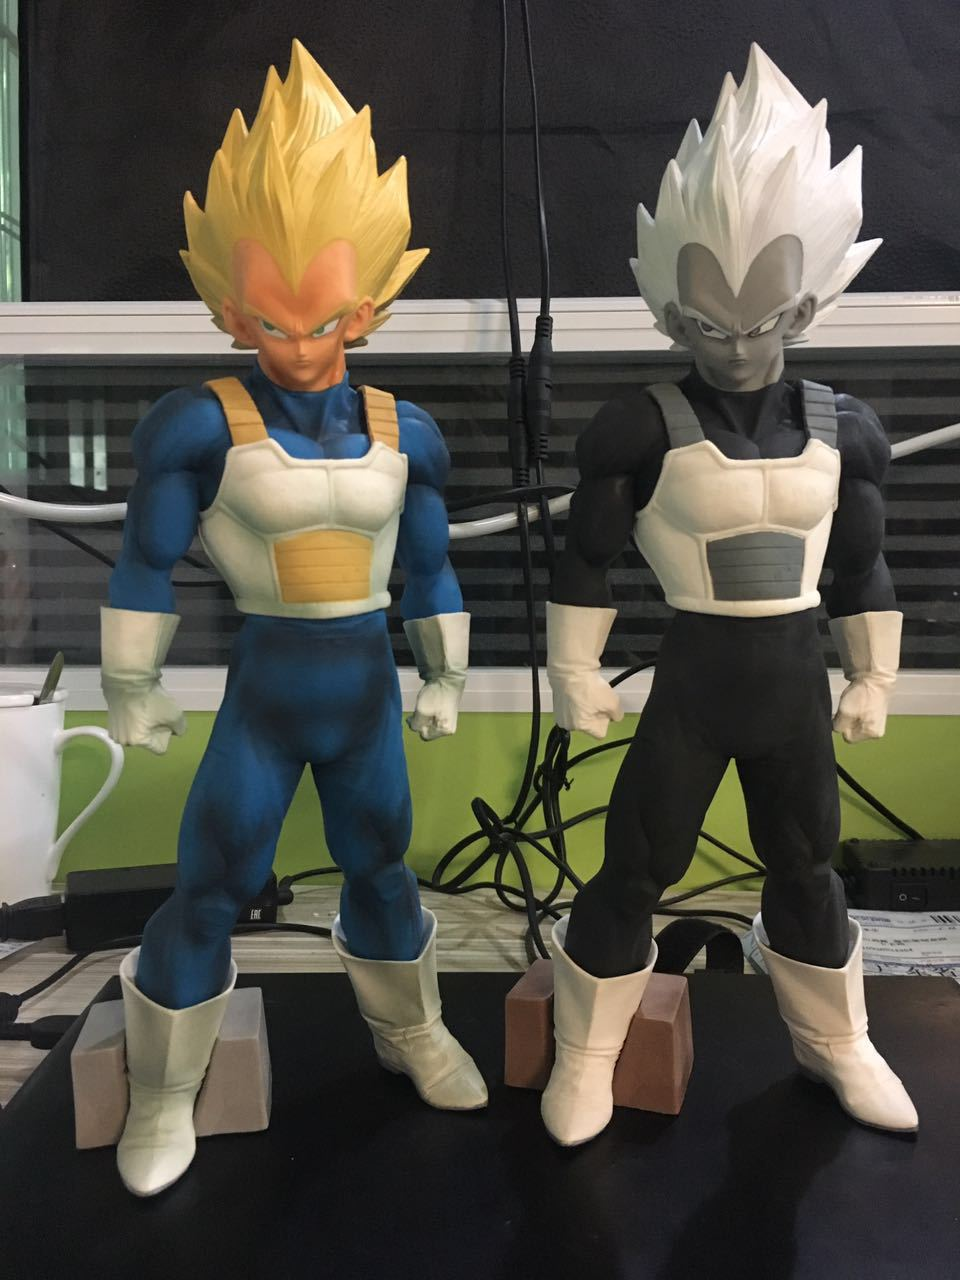 Anime Dragon Ball Z SMSP Super Master Stars Piece Super Saiyan The Vegeta PVC Action Figure Collection Model Kids Toys Doll 32cm<br>